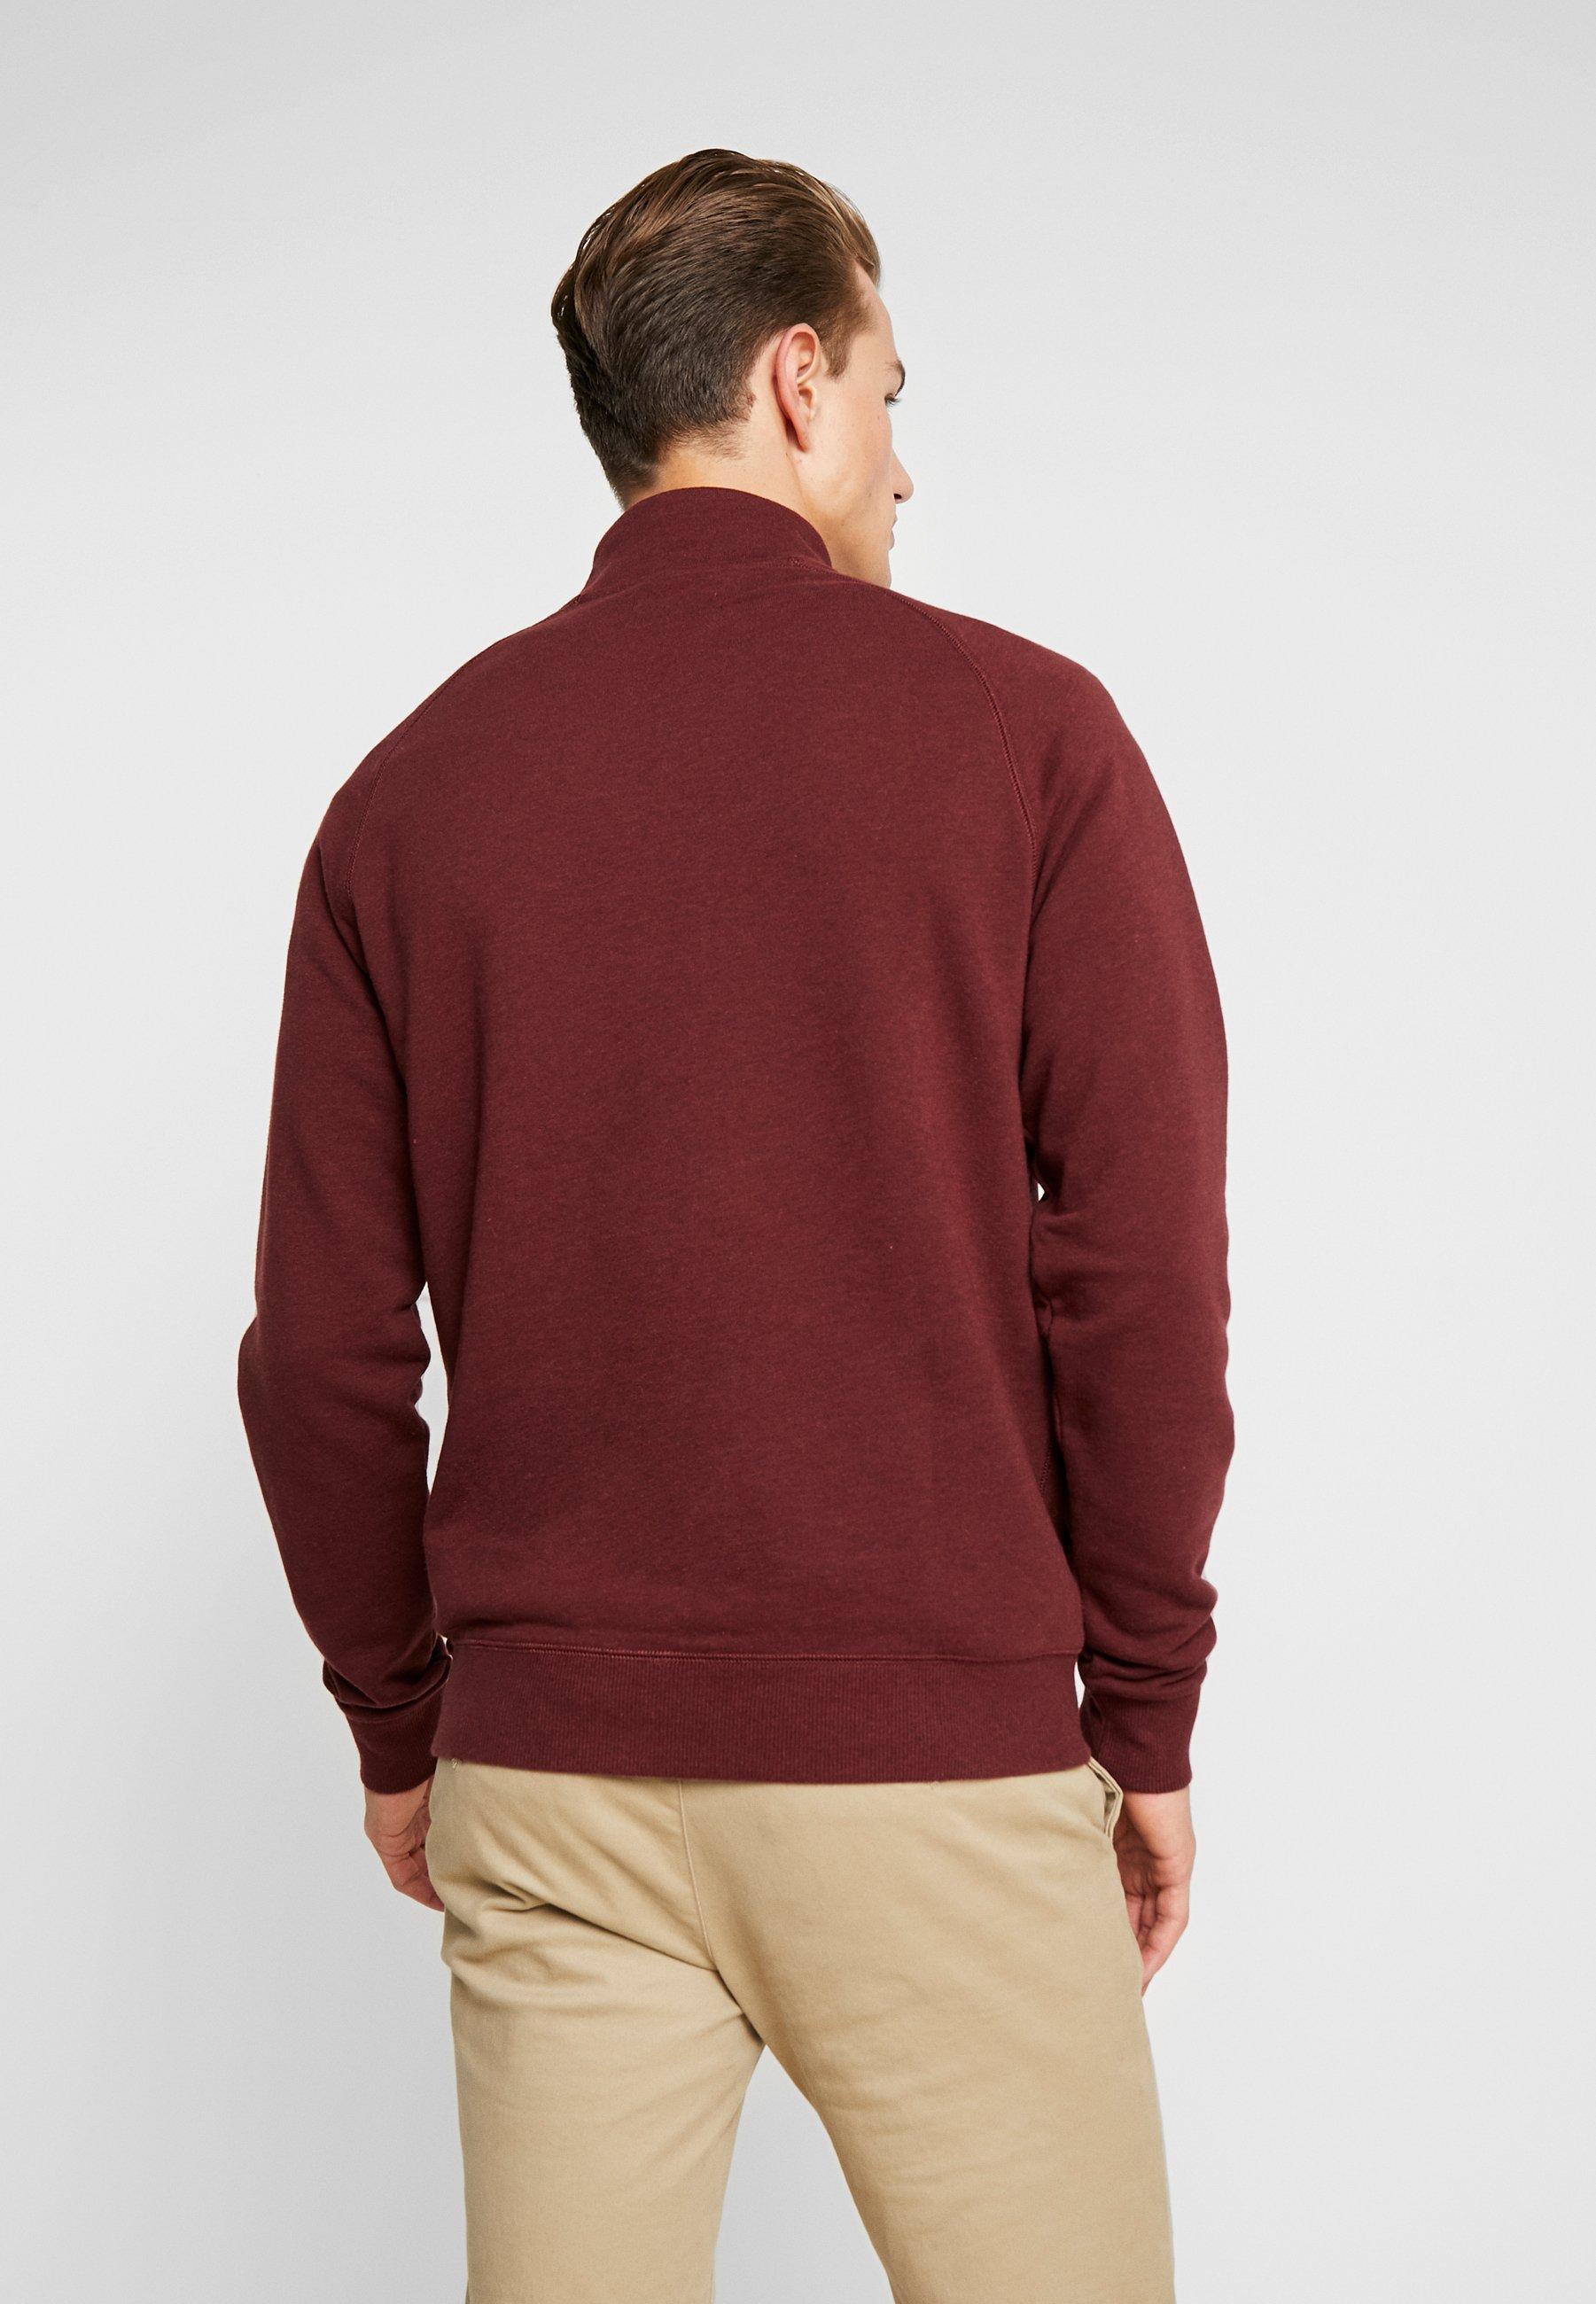 Jim Farah ZipSweatshirt Farah ZipSweatshirt Red Jim Red vmO8yn0Nw